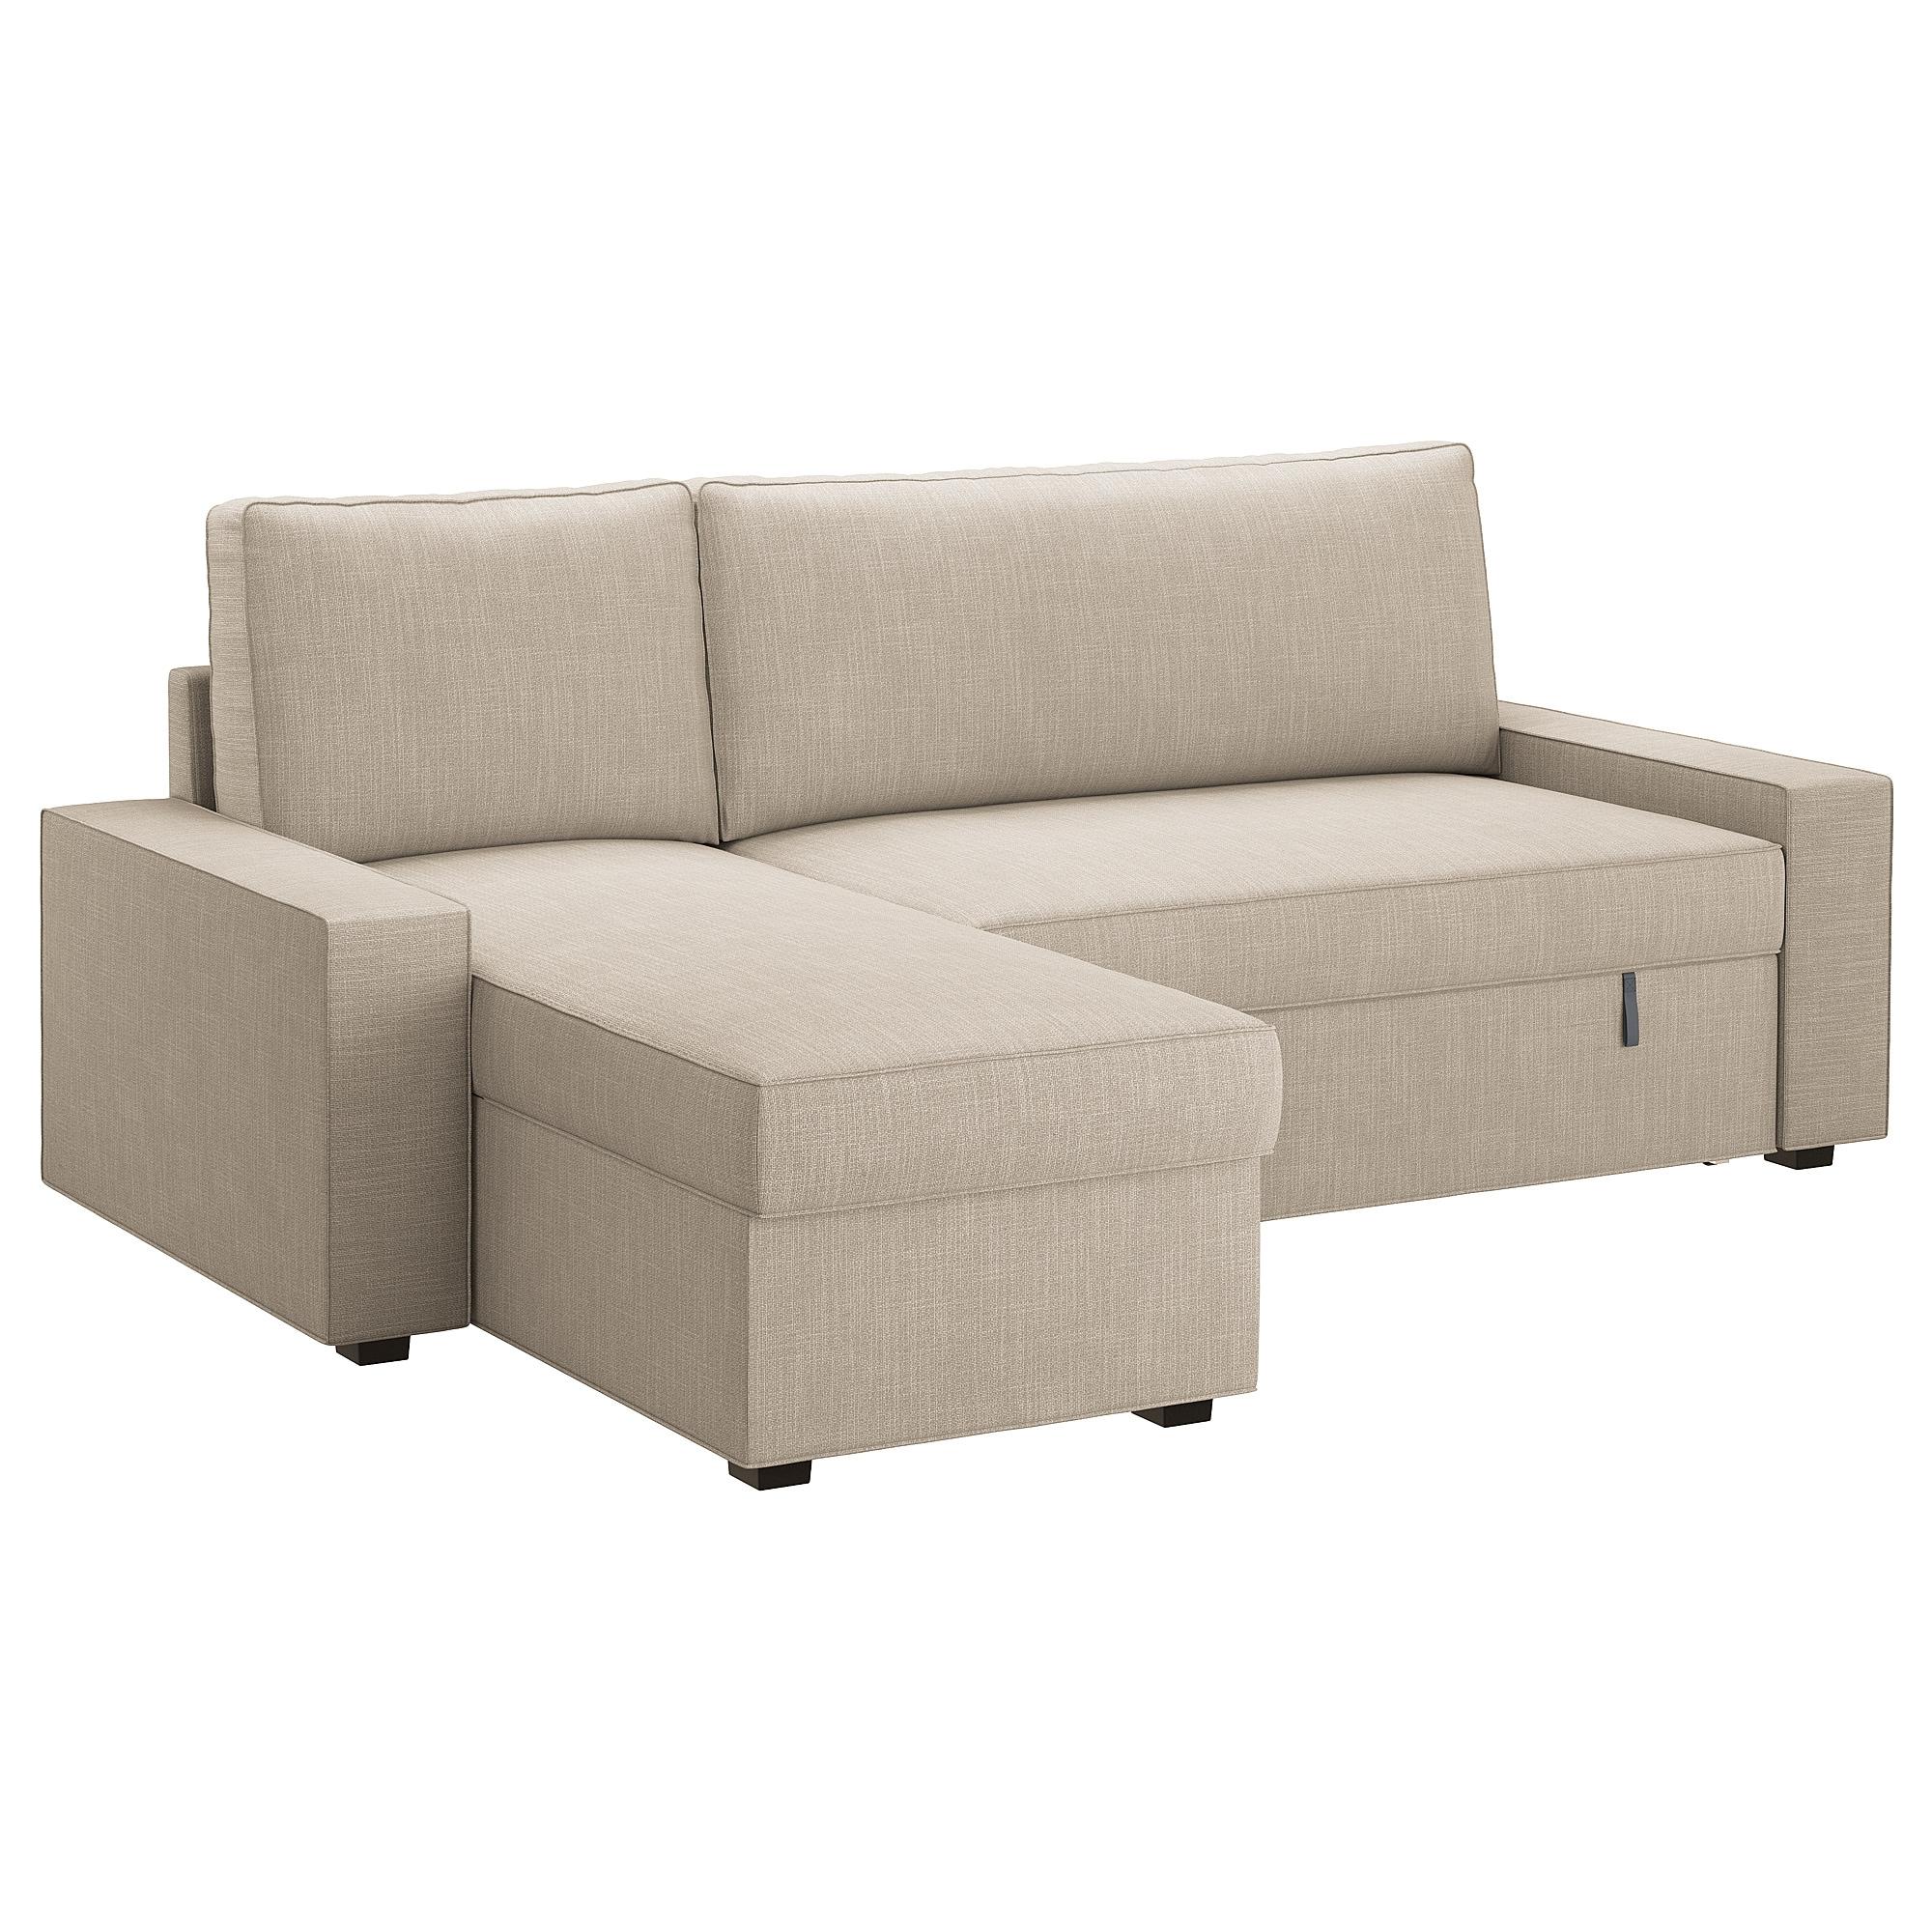 Sofas Baratos Coruña 4pde Vilasund sofà Cama Con Chaiselongue Hillared Beige Ikea